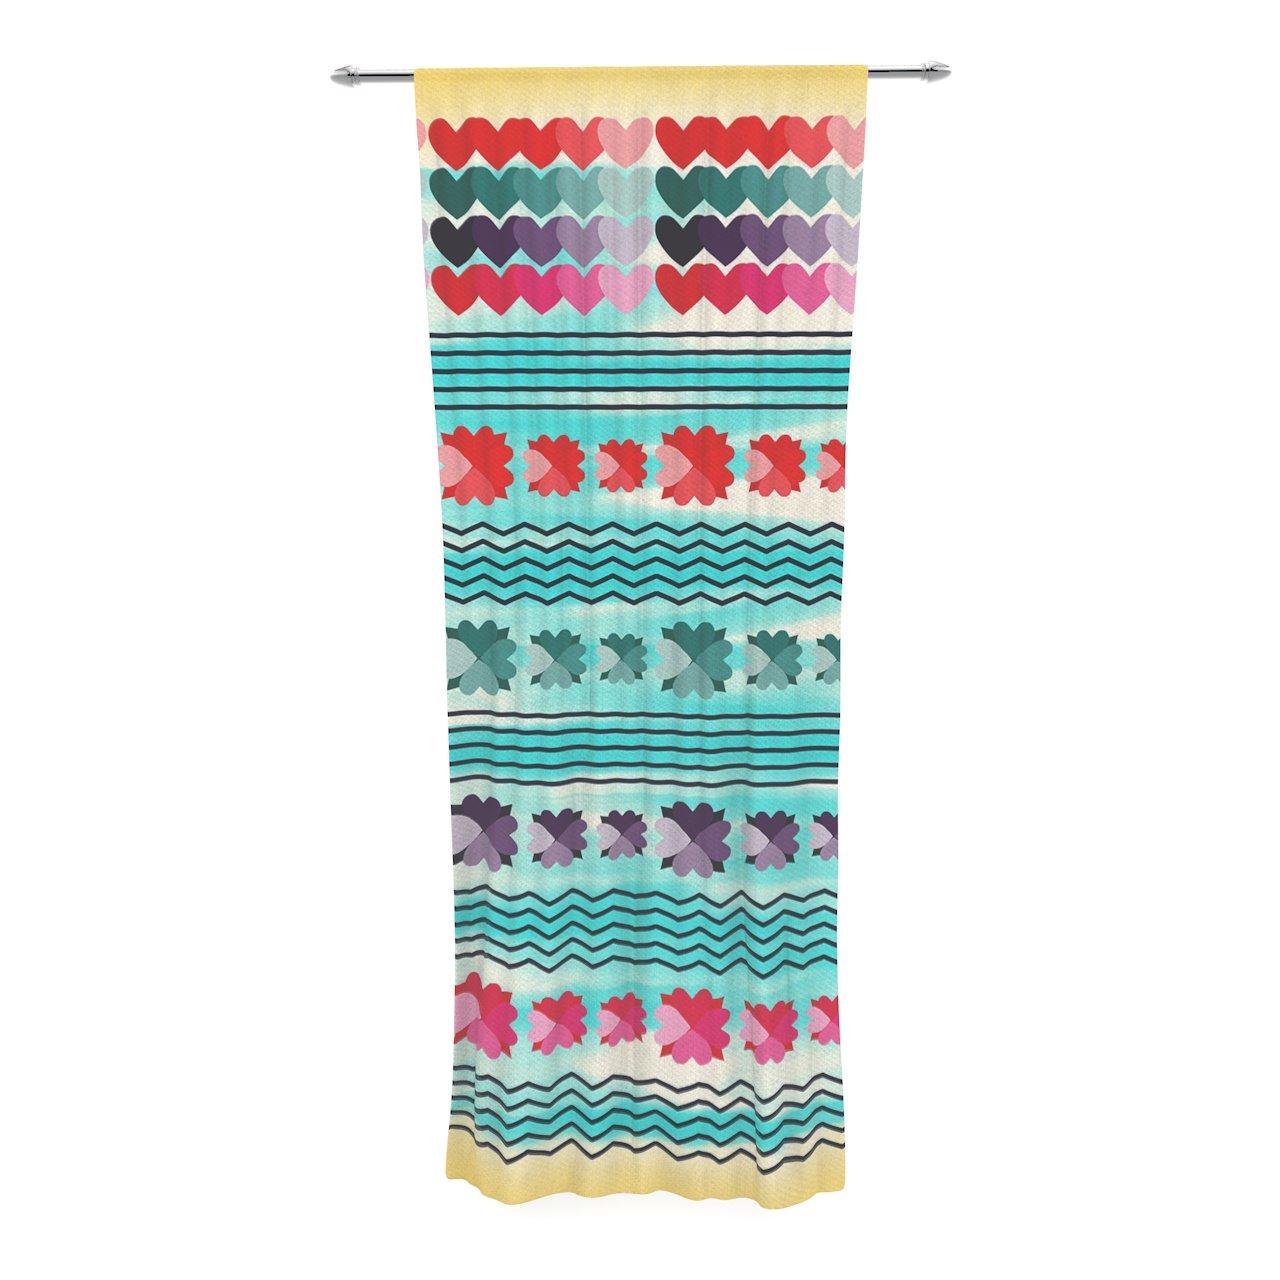 30 x 84 Sheer Curtains Kess InHouse Oriana Cordero Agate Blue Orange Decorative Set